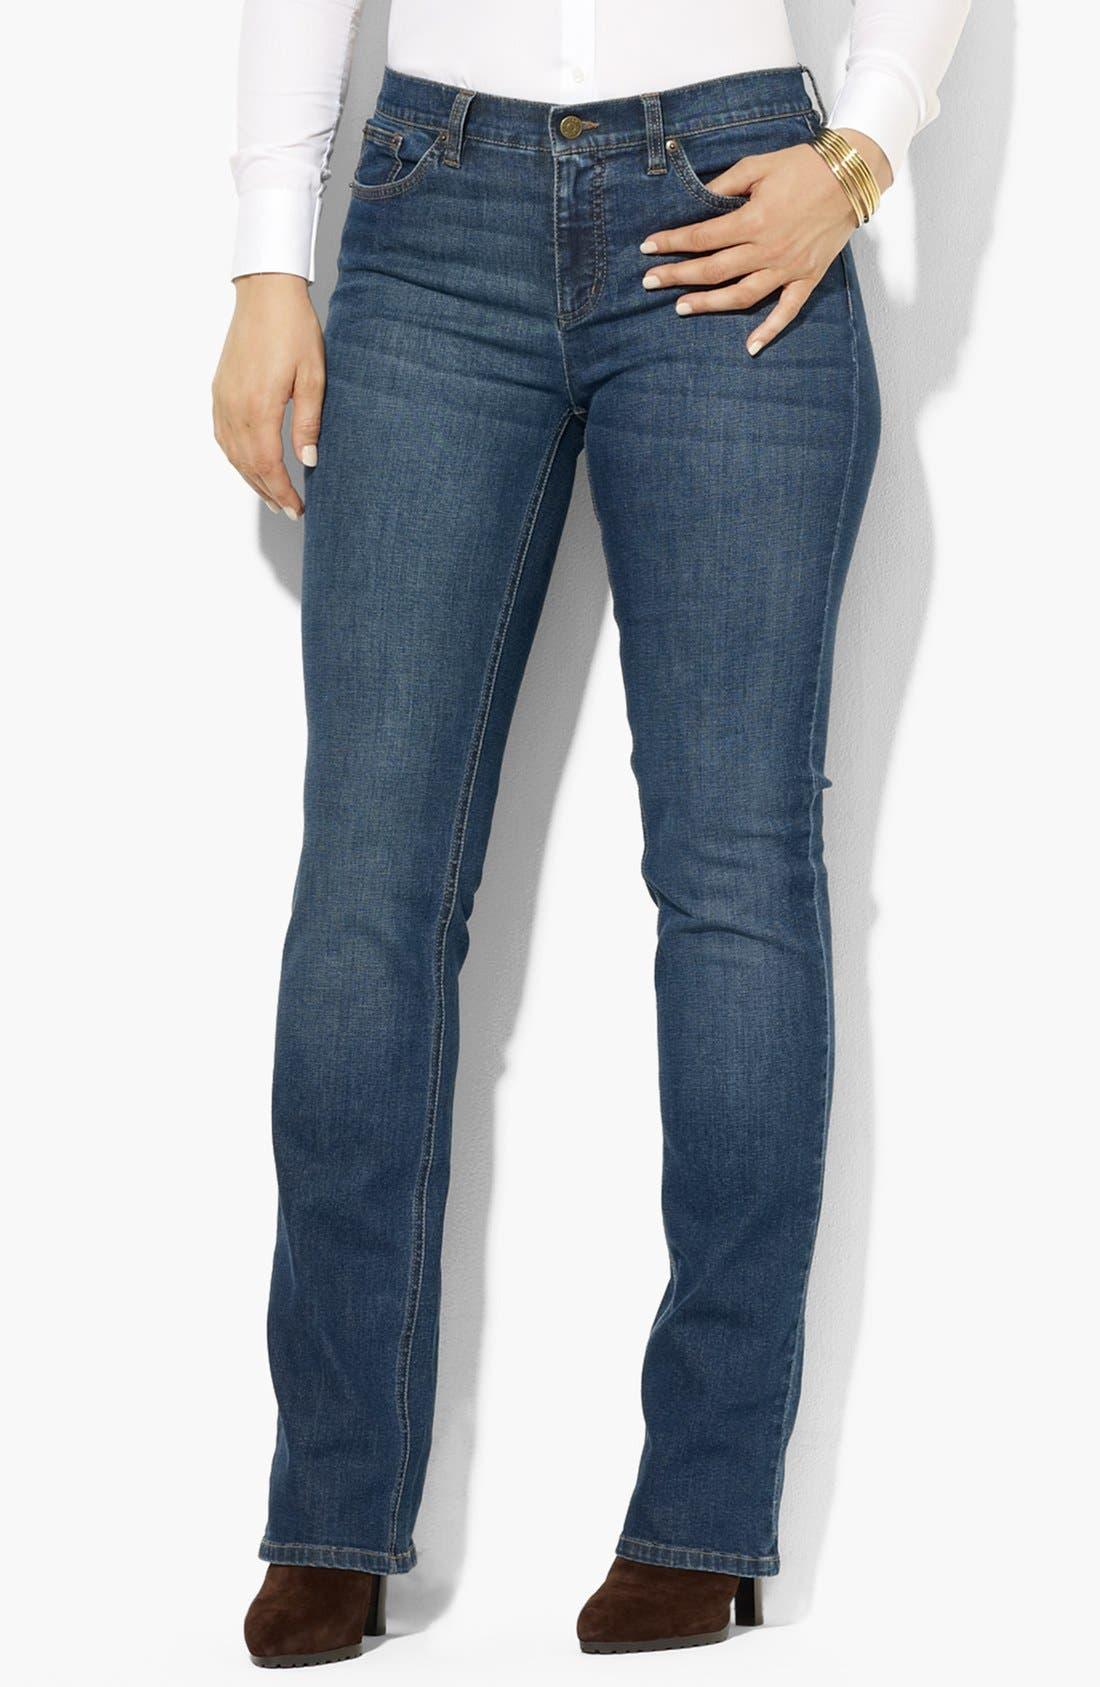 Alternate Image 1 Selected - Lauren Ralph Lauren Straight Leg Jeans (Plus Size)